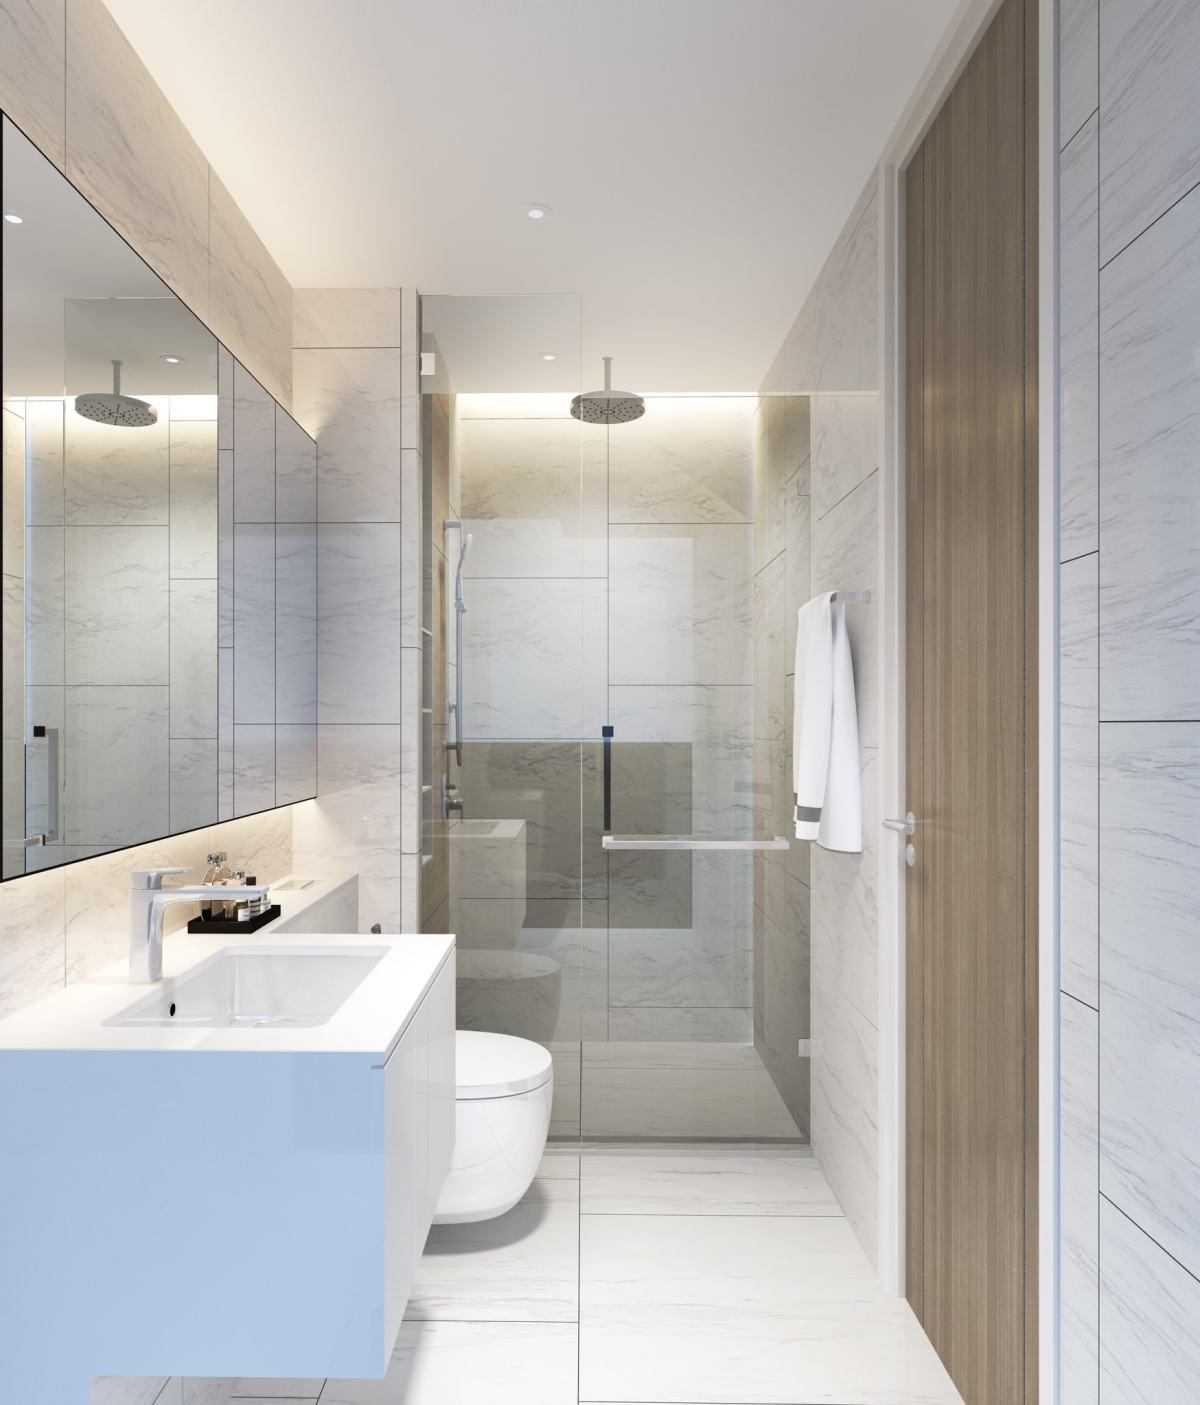 ANIL Sathorn 12 คอนโดสาทรสุดหรูที่ยกระดับคุณภาพชีวิตของผู้พักอาศัย ด้วยมาตรฐาน WELL Building Standard 109 - GRAND UNITY